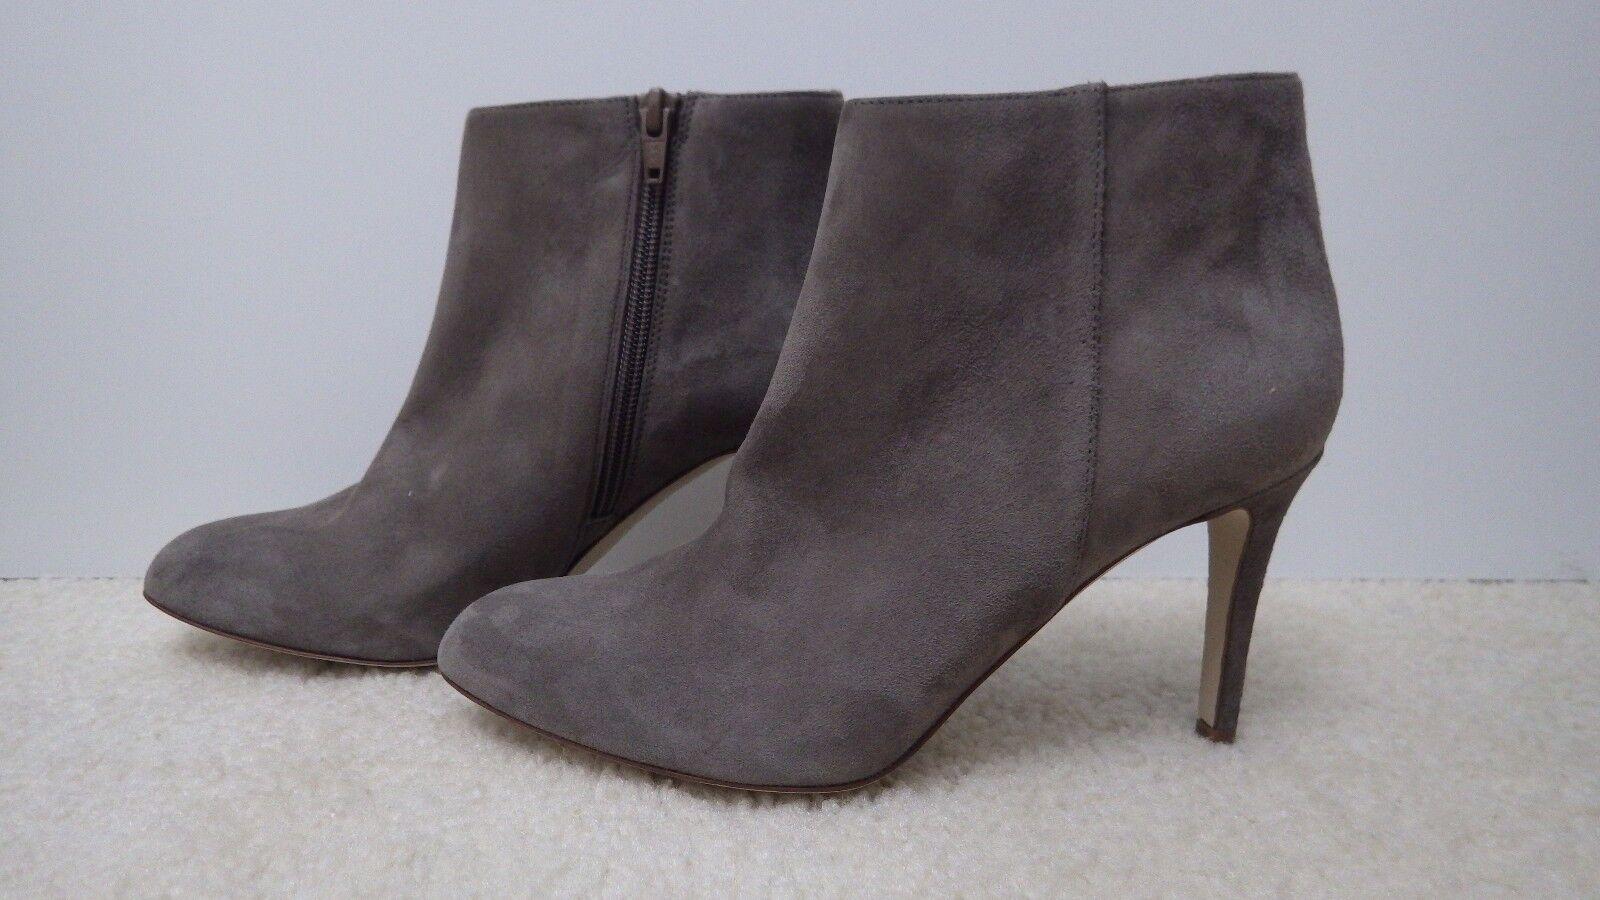 New mujer J.Crew Metropolitan Suede Ankle gris, botas, Highland gris, Ankle Talla 7.5 cdbb13